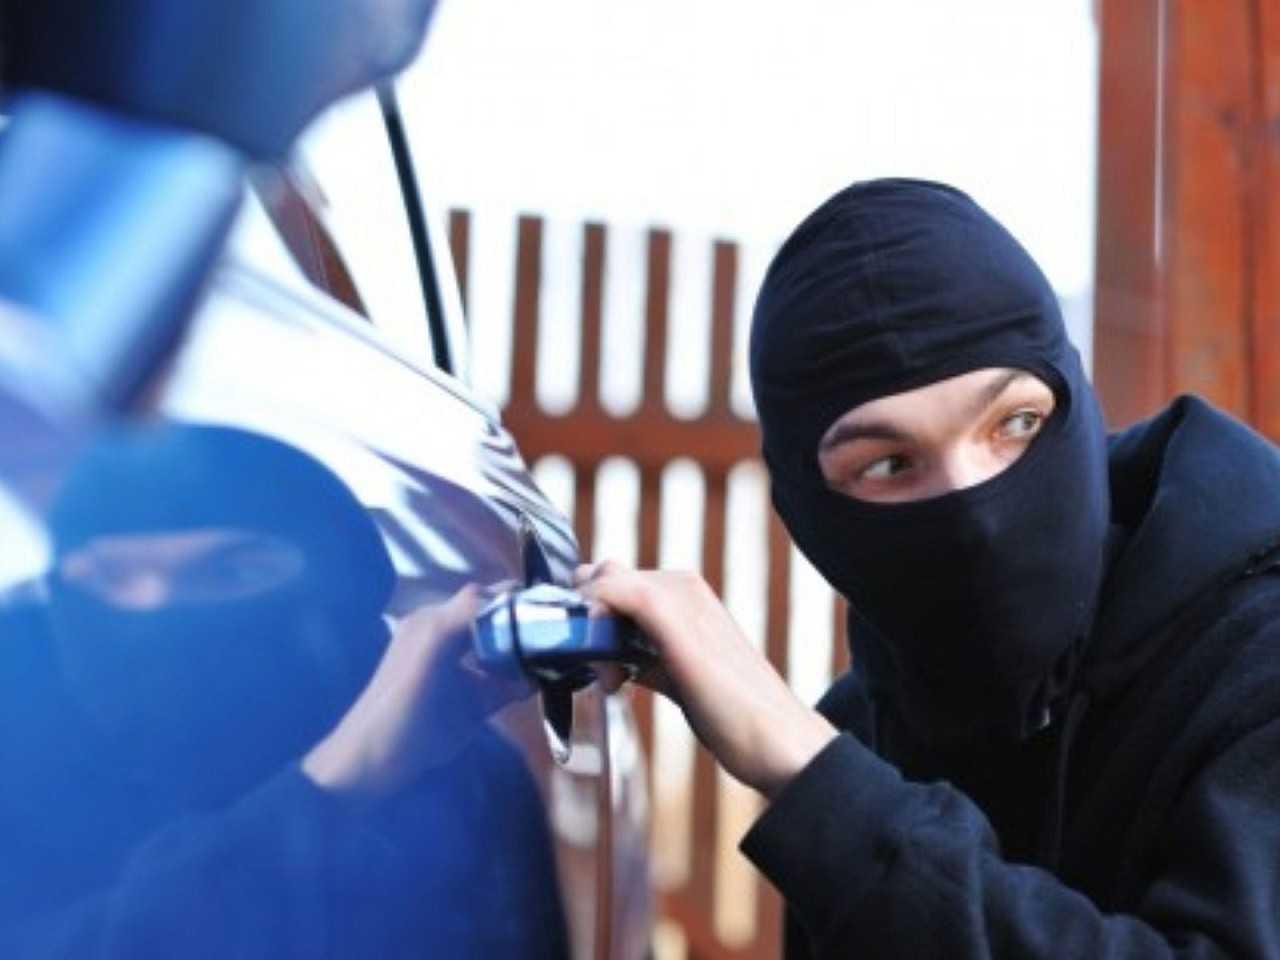 Dicas para evitar roubo e furto de veículos